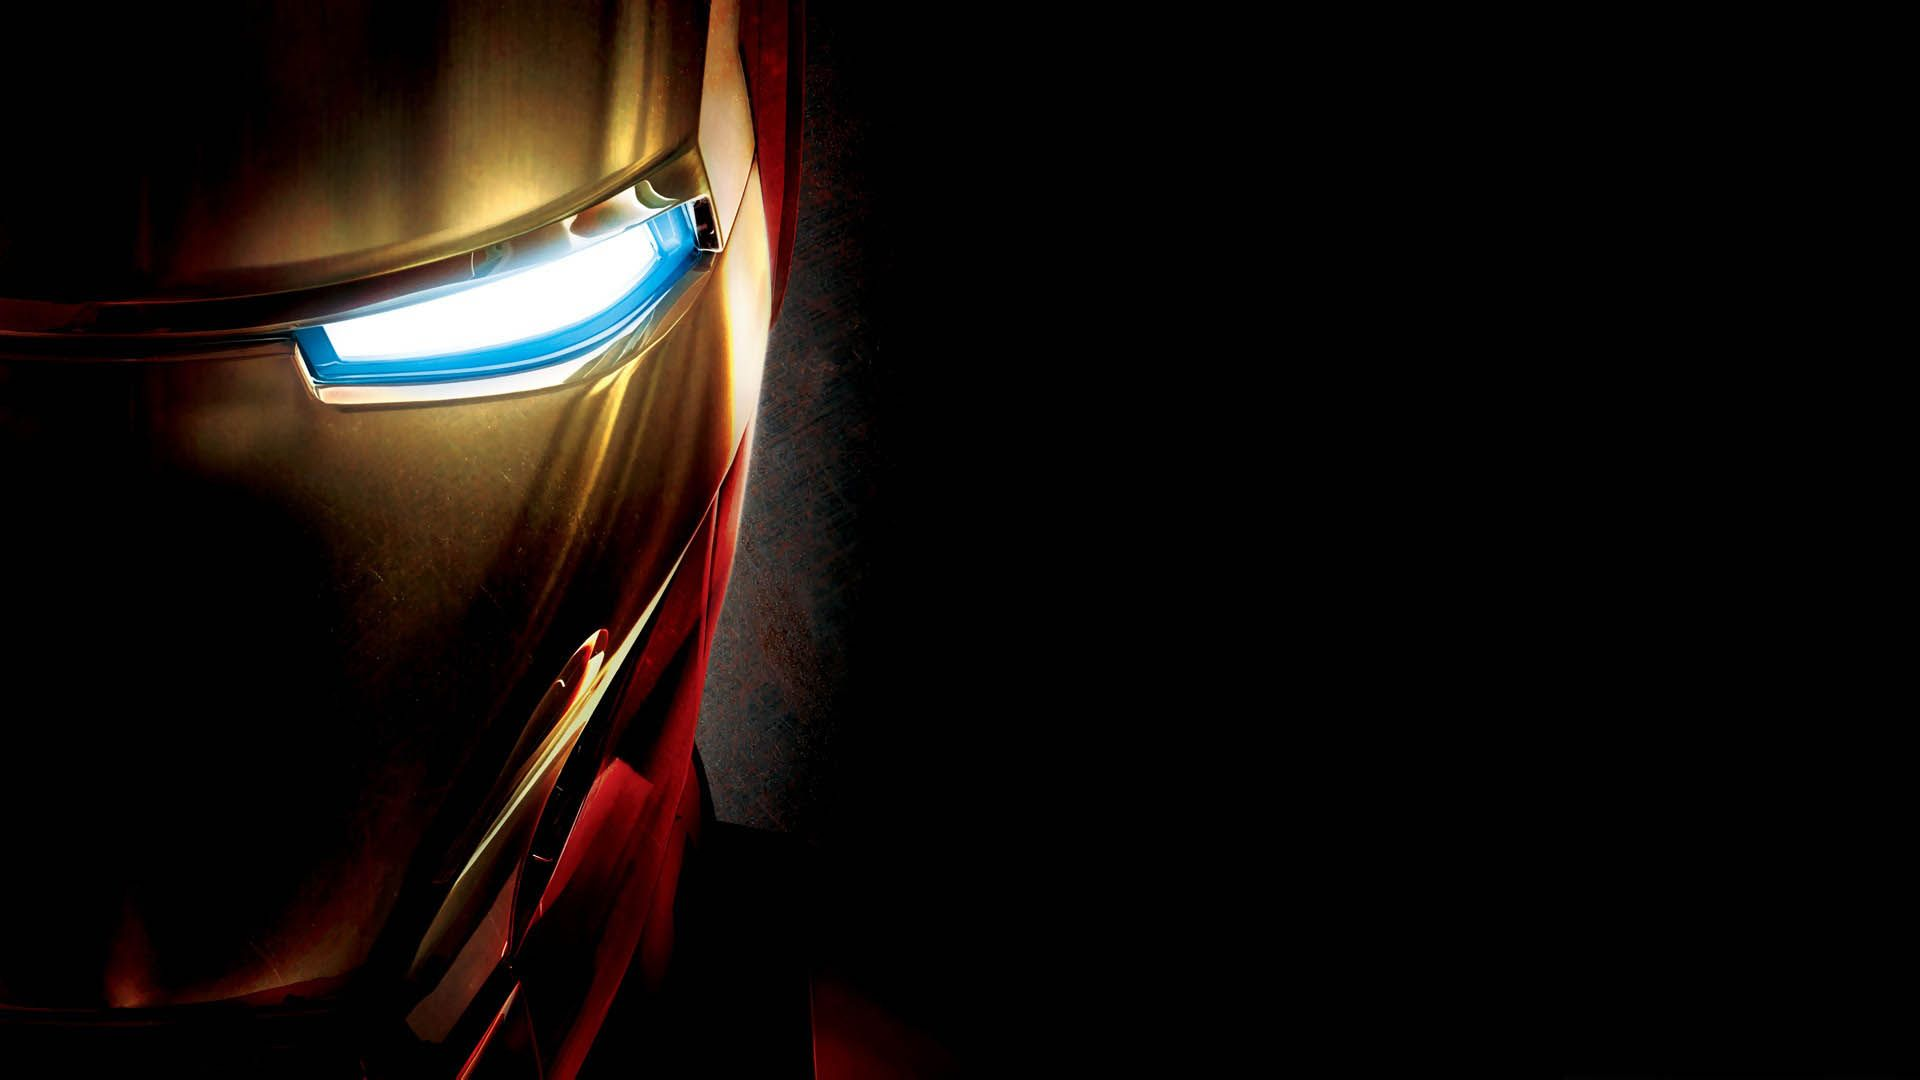 iron man wallpaper hd 1080p,red,light,automotive lighting,automotive design,darkness